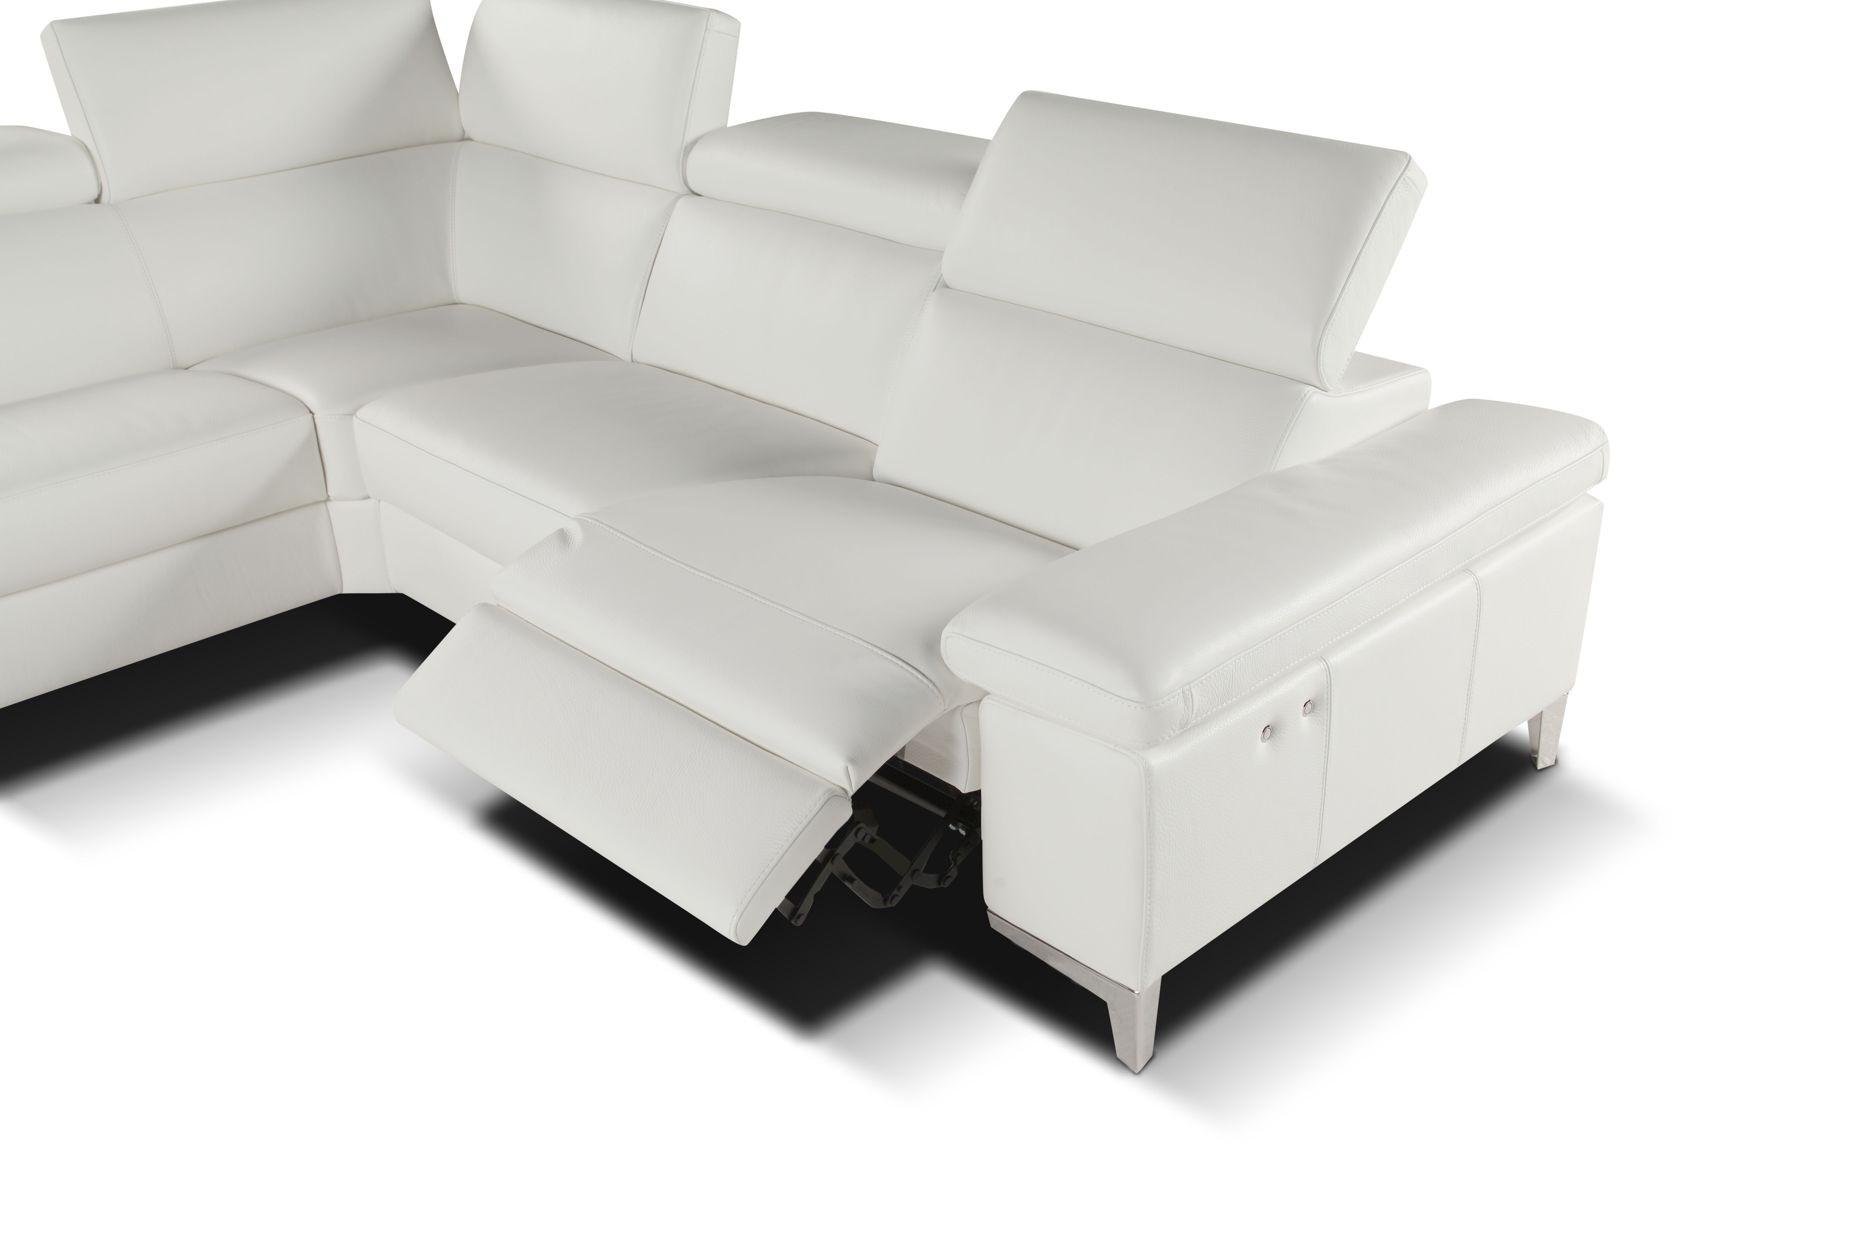 Giuseppe&giuseppe Pertaining To Modern Reclining Leather Sofas (View 16 of 20)